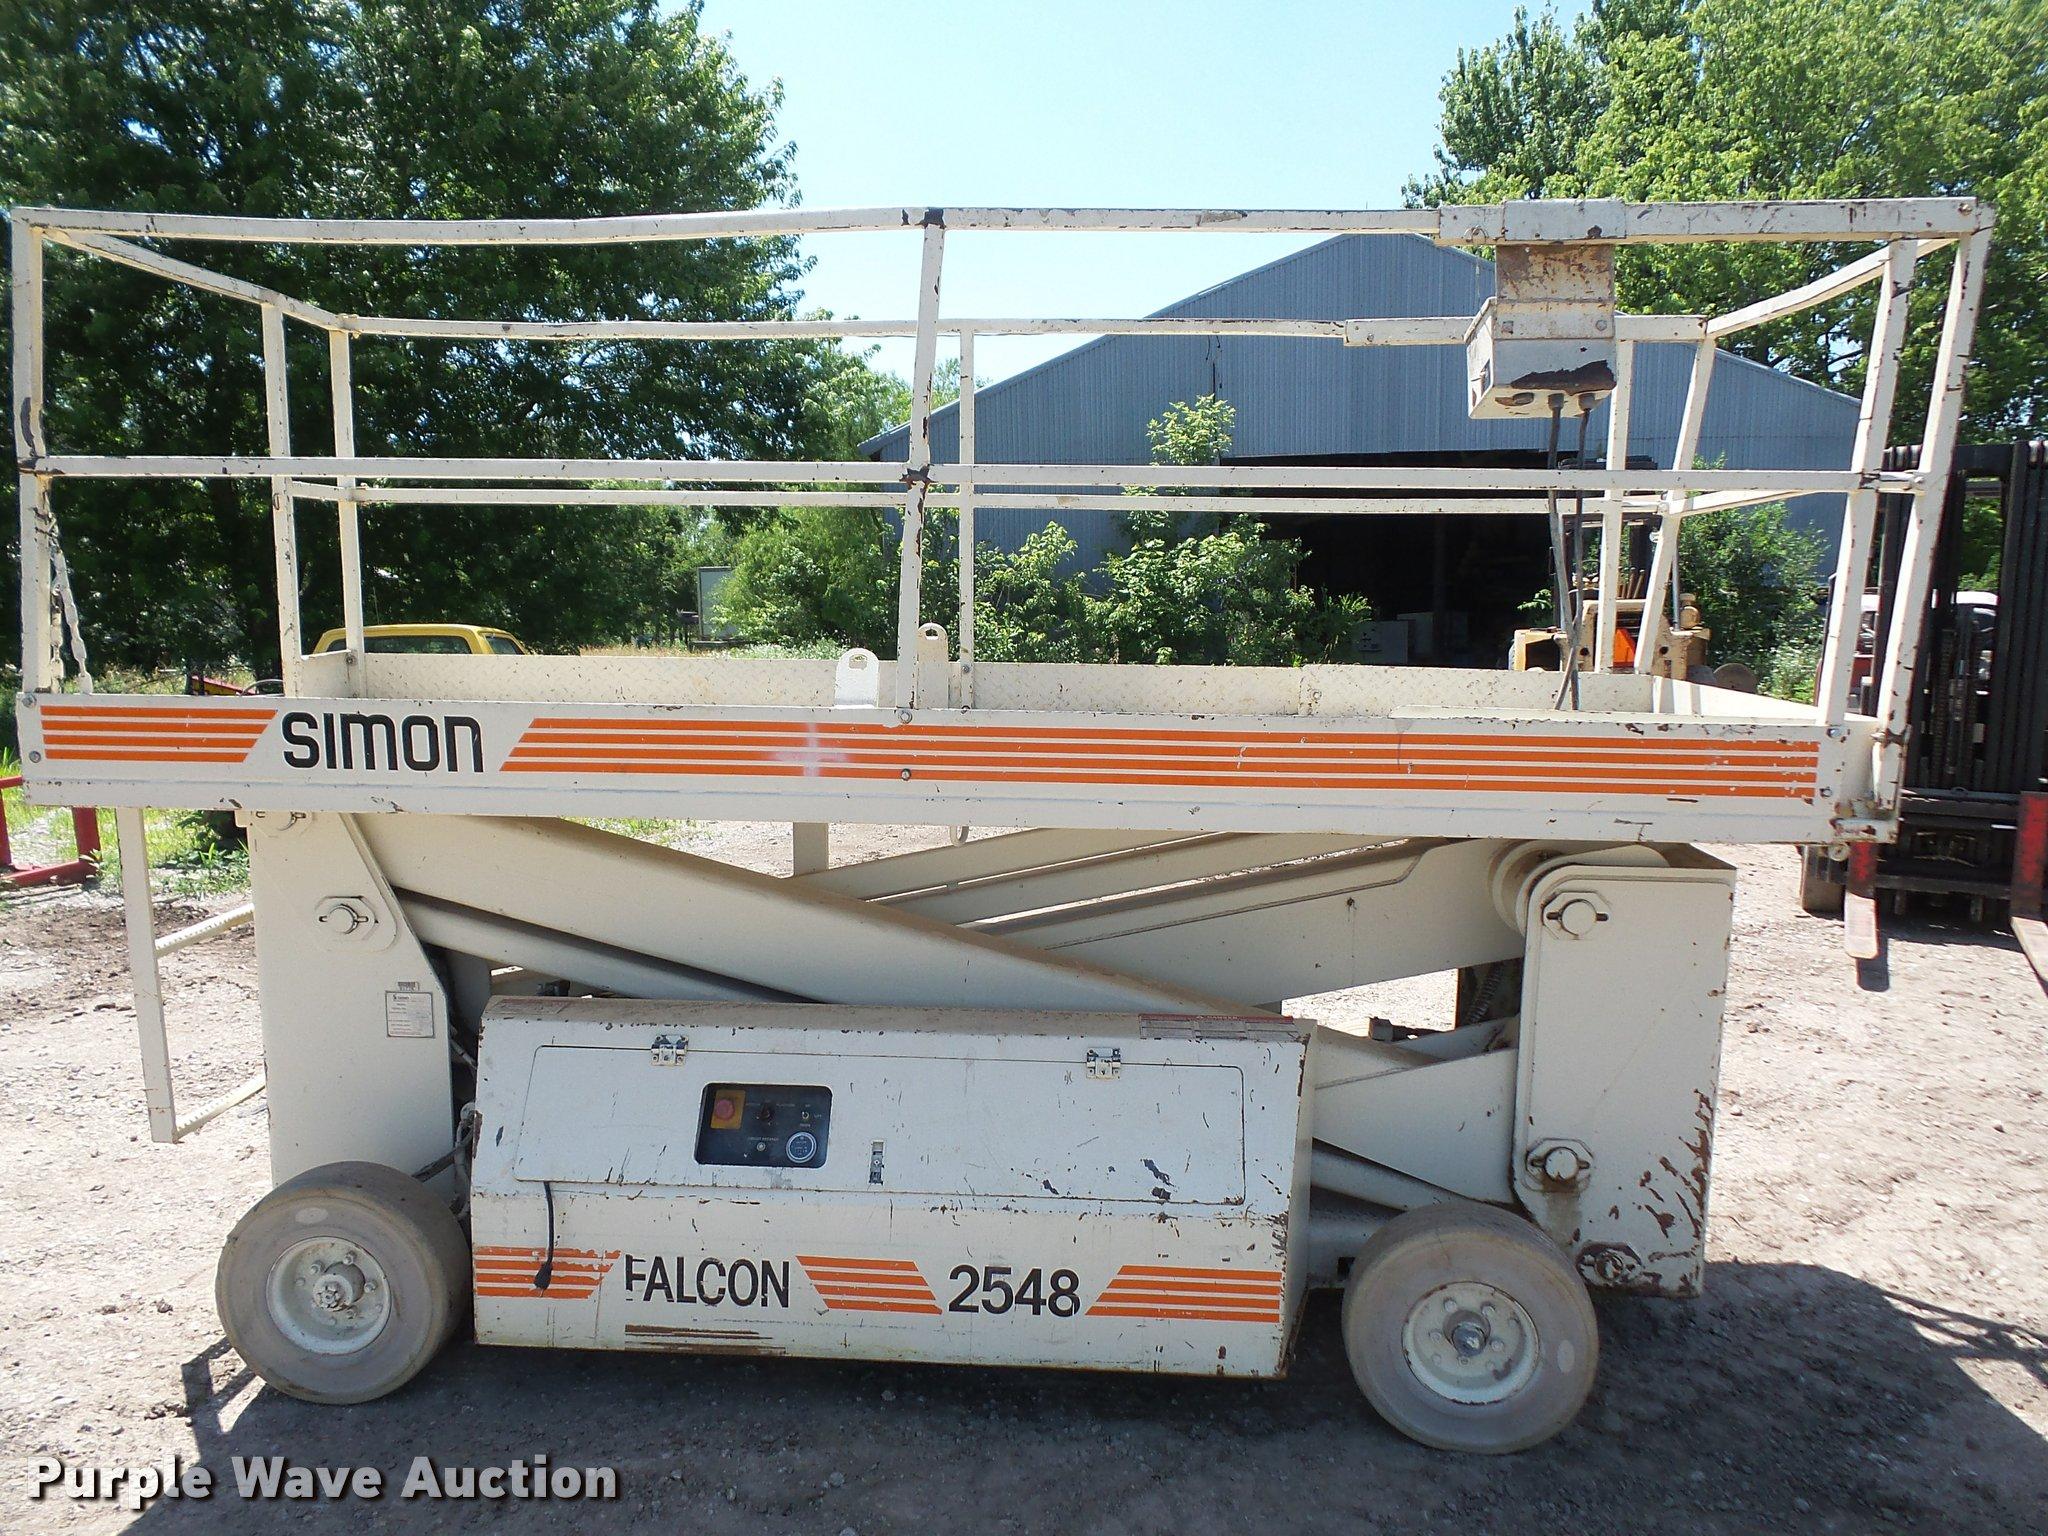 simon falcon 2548 scissor lift item da6456 sold july 19 rh purplewave com Manual Aerial Lifts Safety Aerial Lift Operators Manual